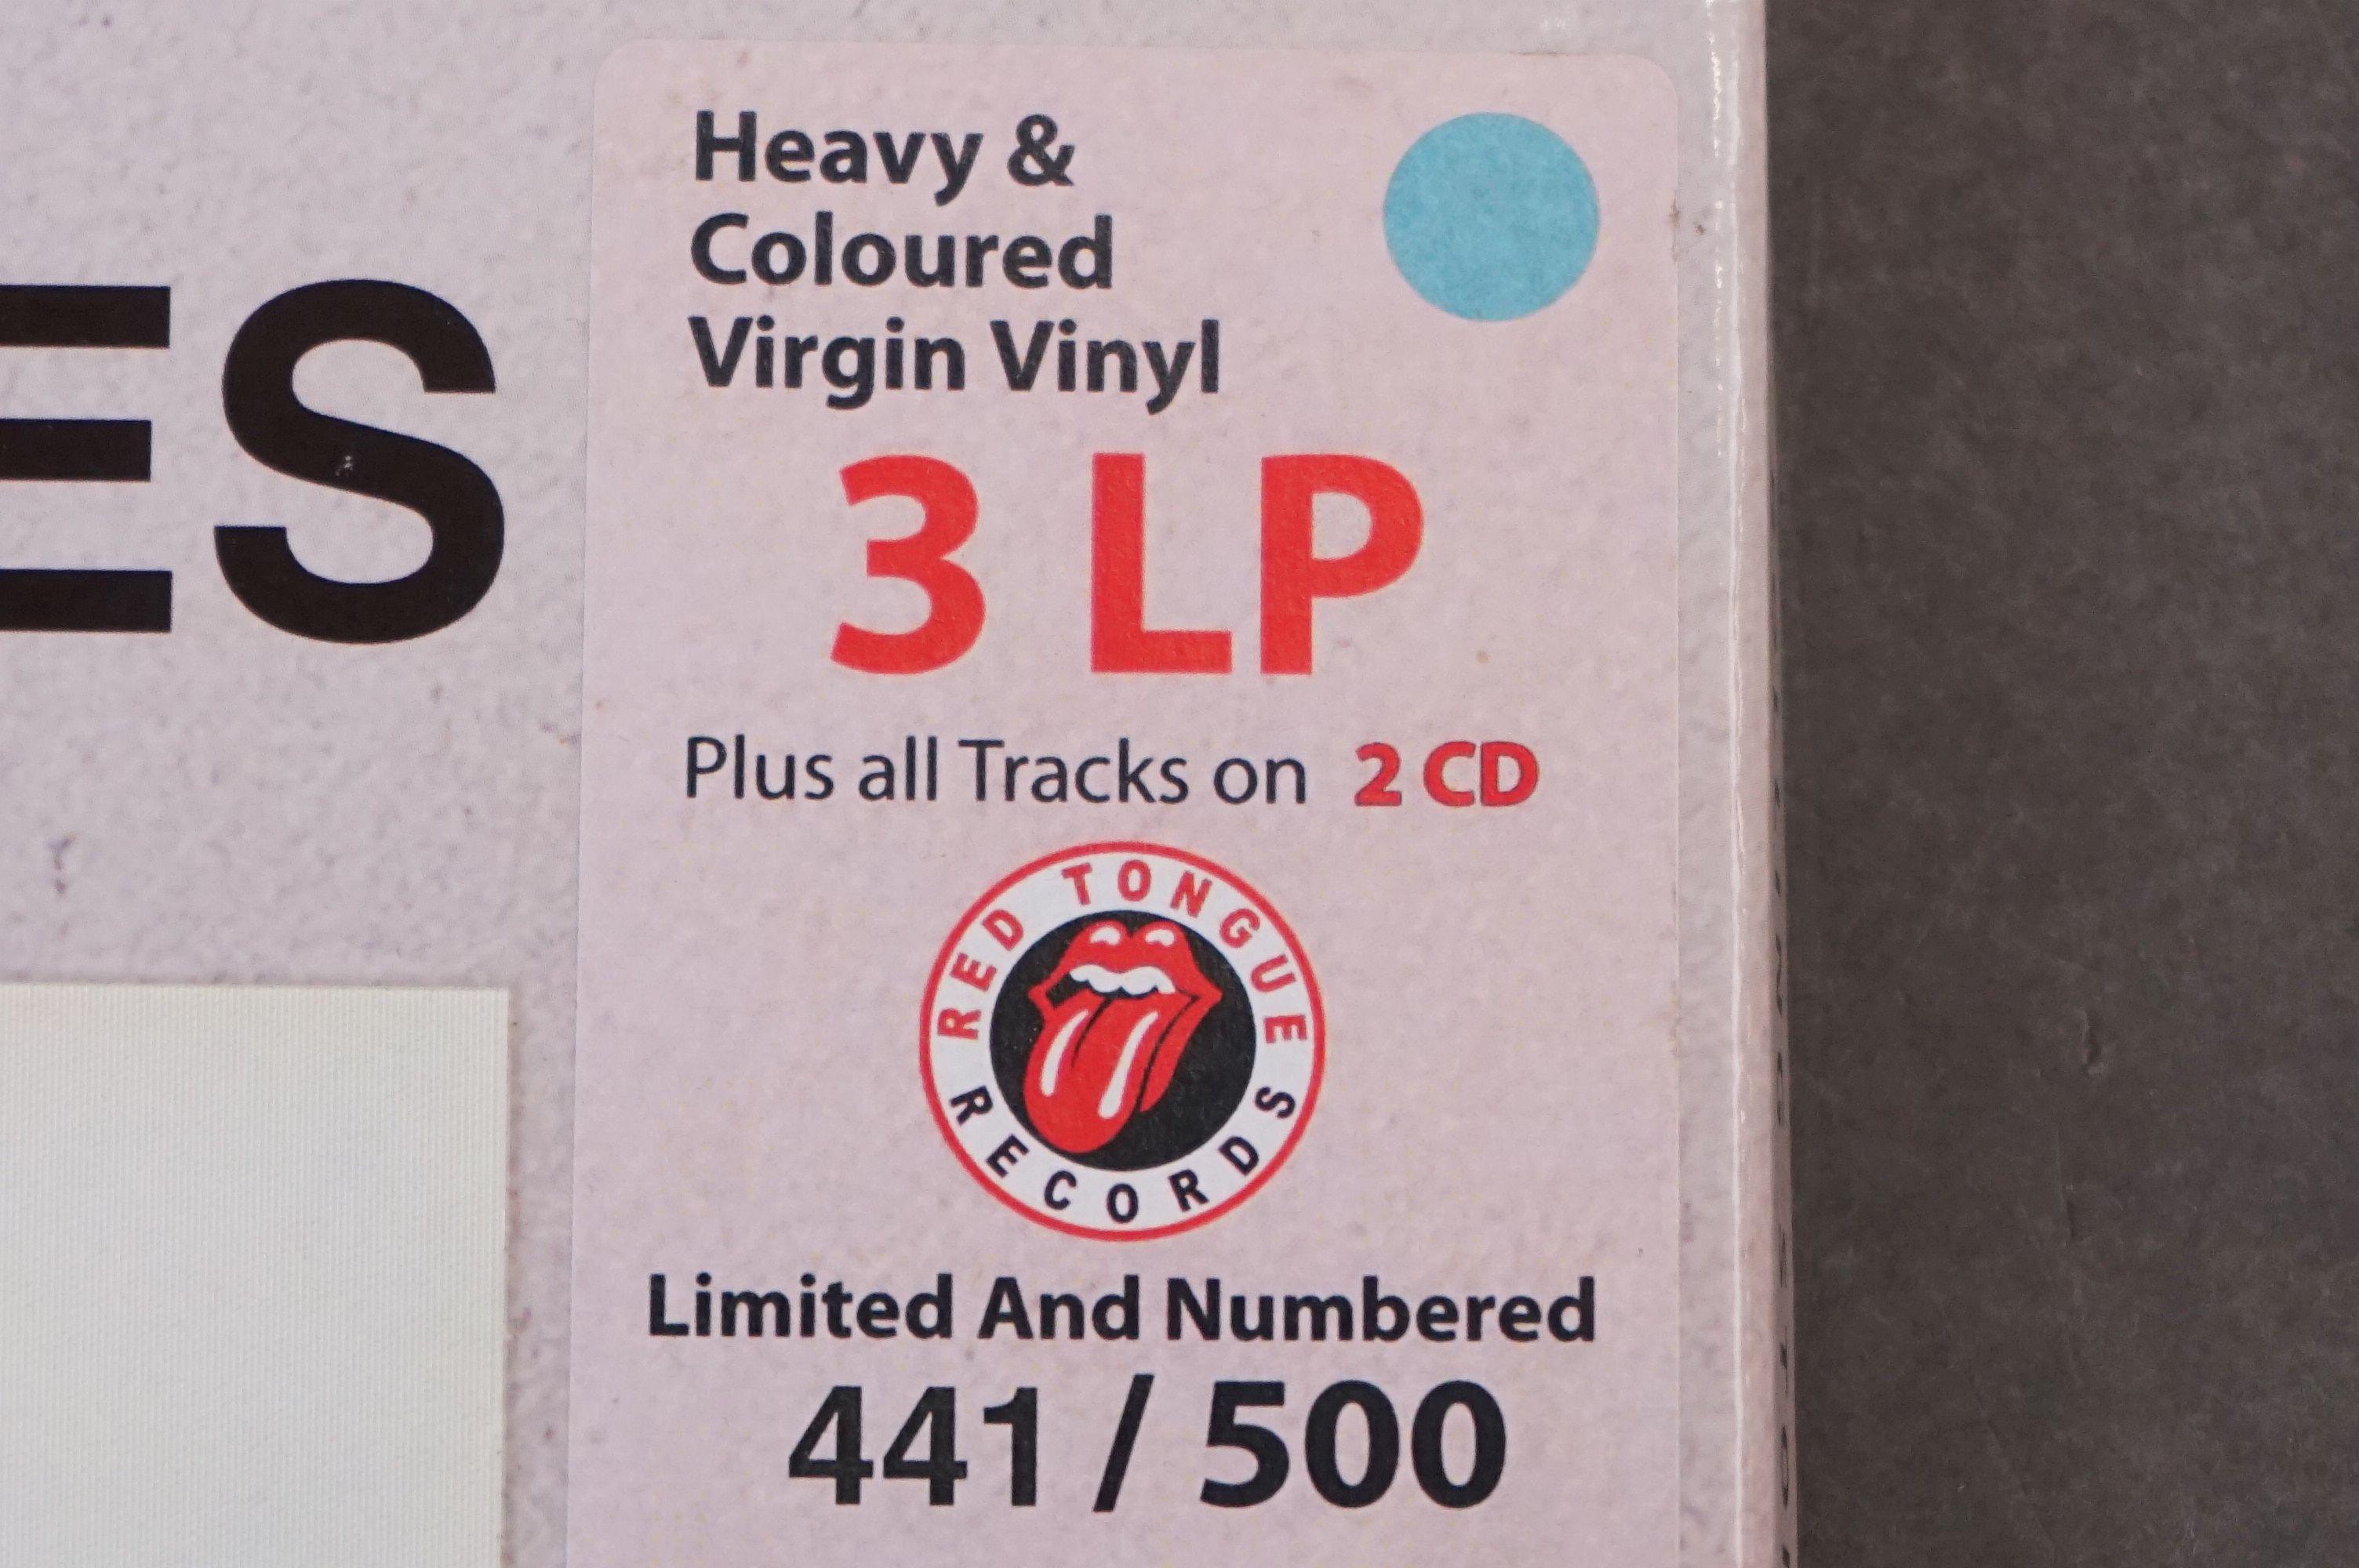 Vinyl - ltd edn The Real Alternate Album Rolling Stones Let It Bleed 3 LP / 2 CD Box Set RTR011, - Image 9 of 9